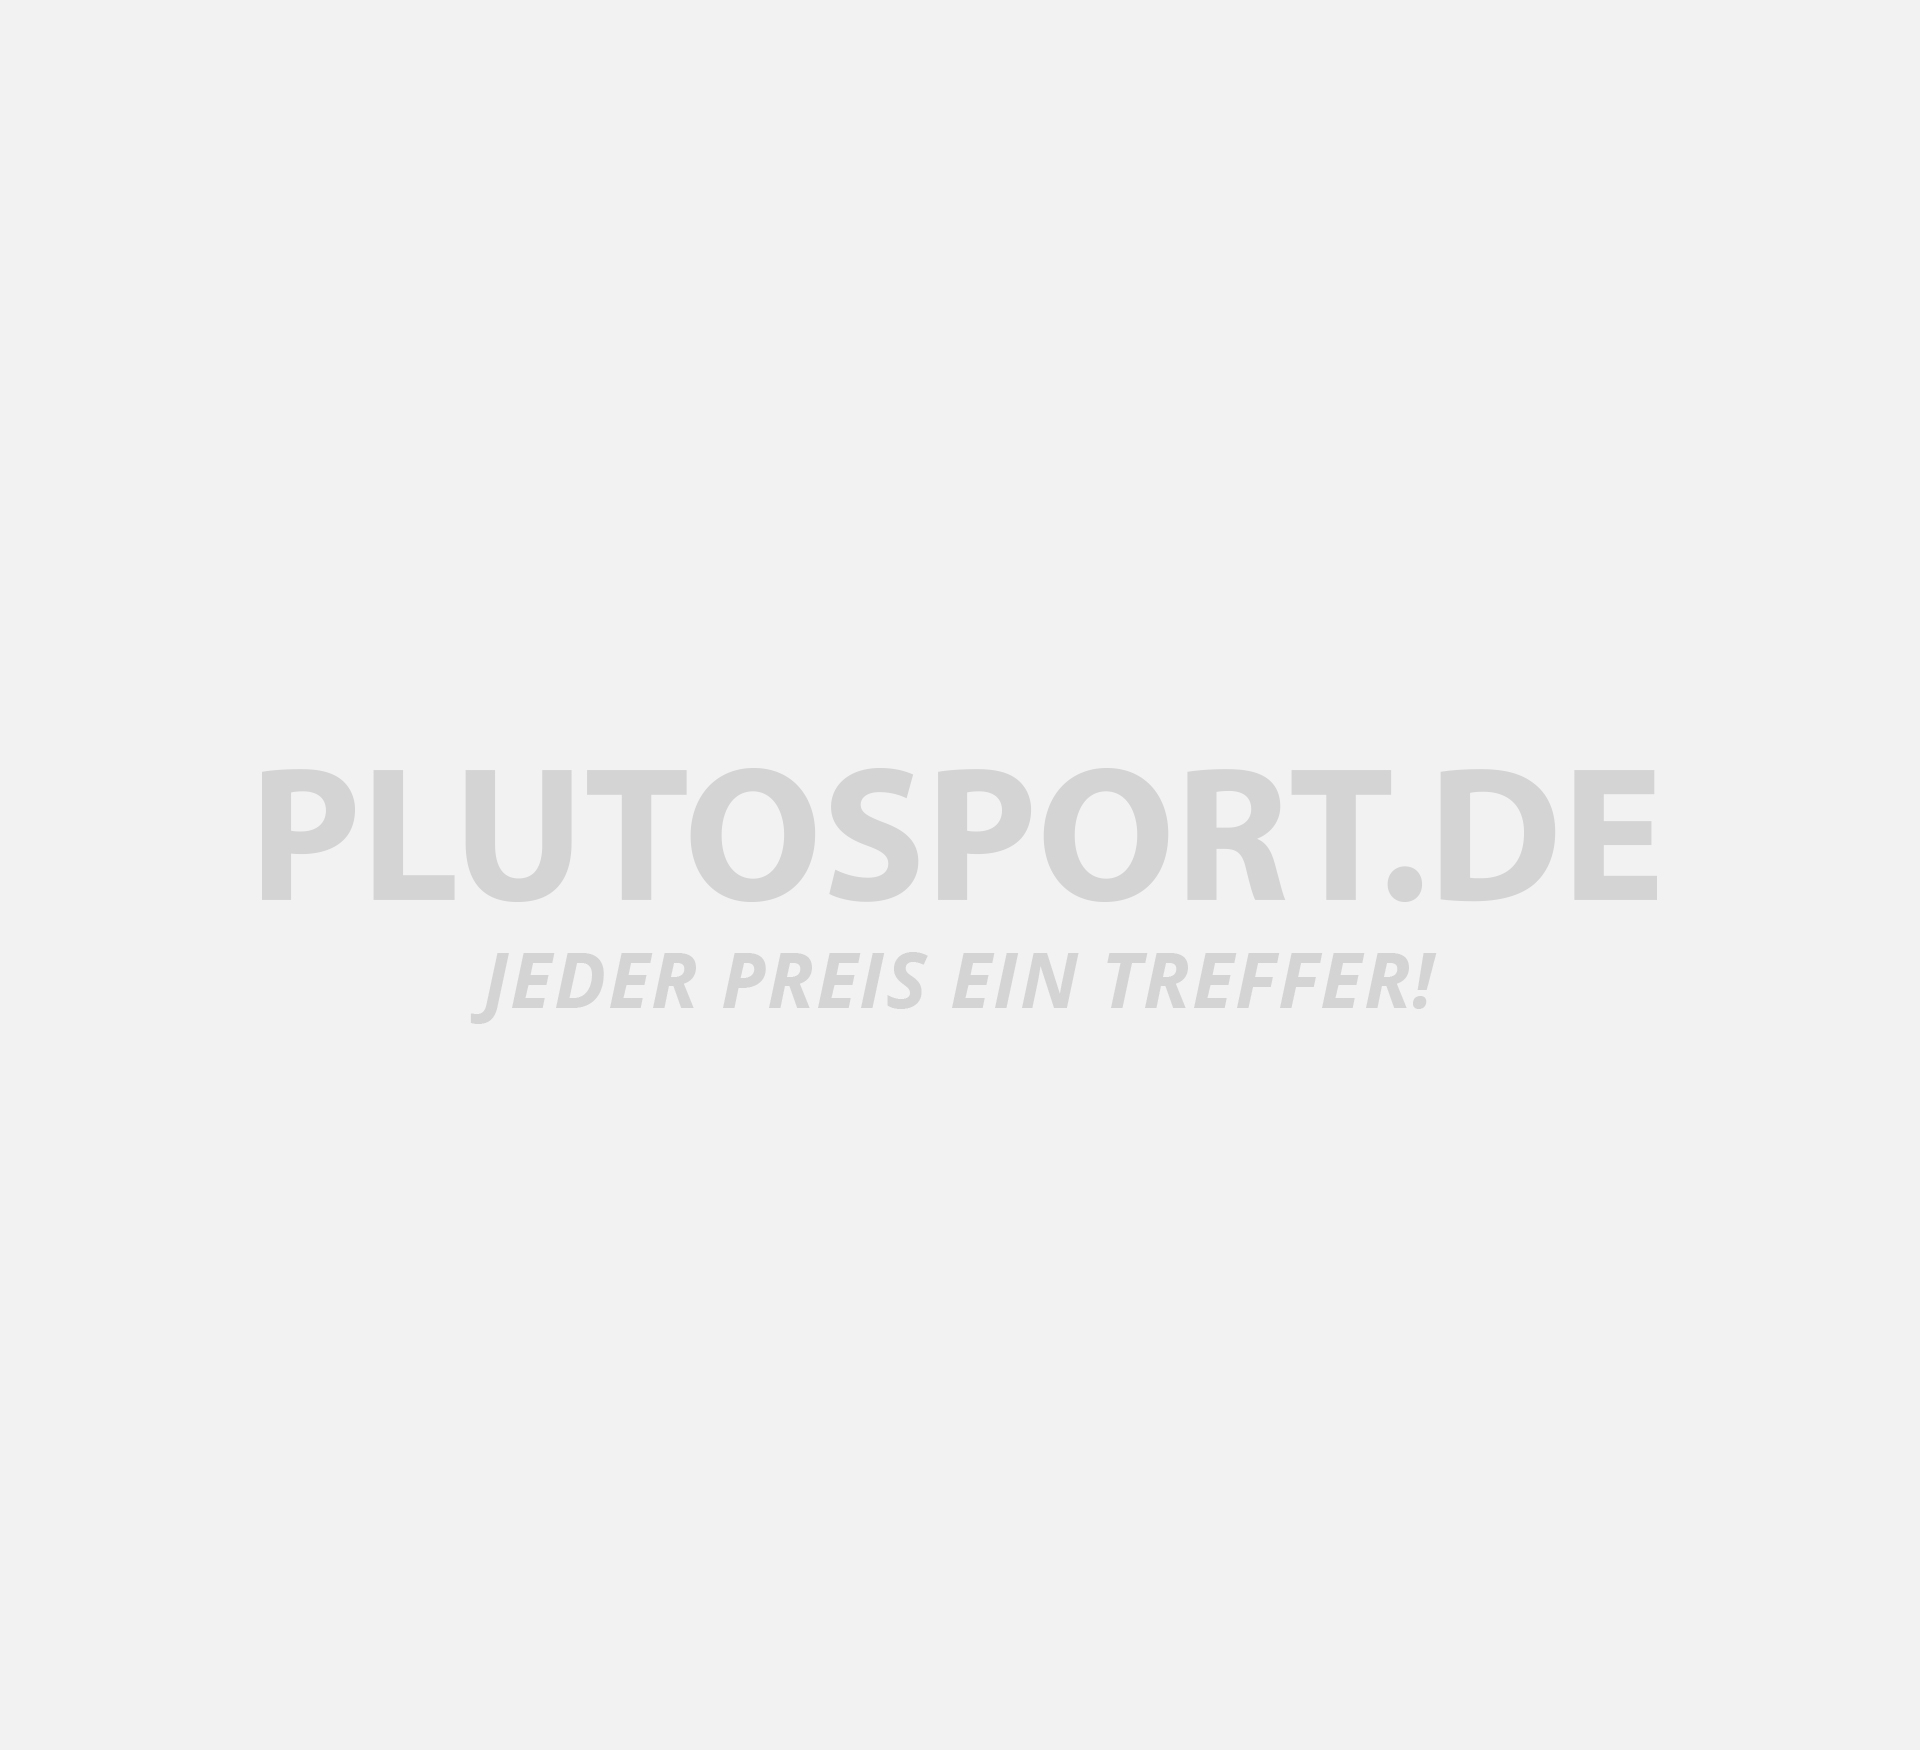 Uhlsport Hyperact Absolutegrip Reflex Torwarthandschuhe Senior